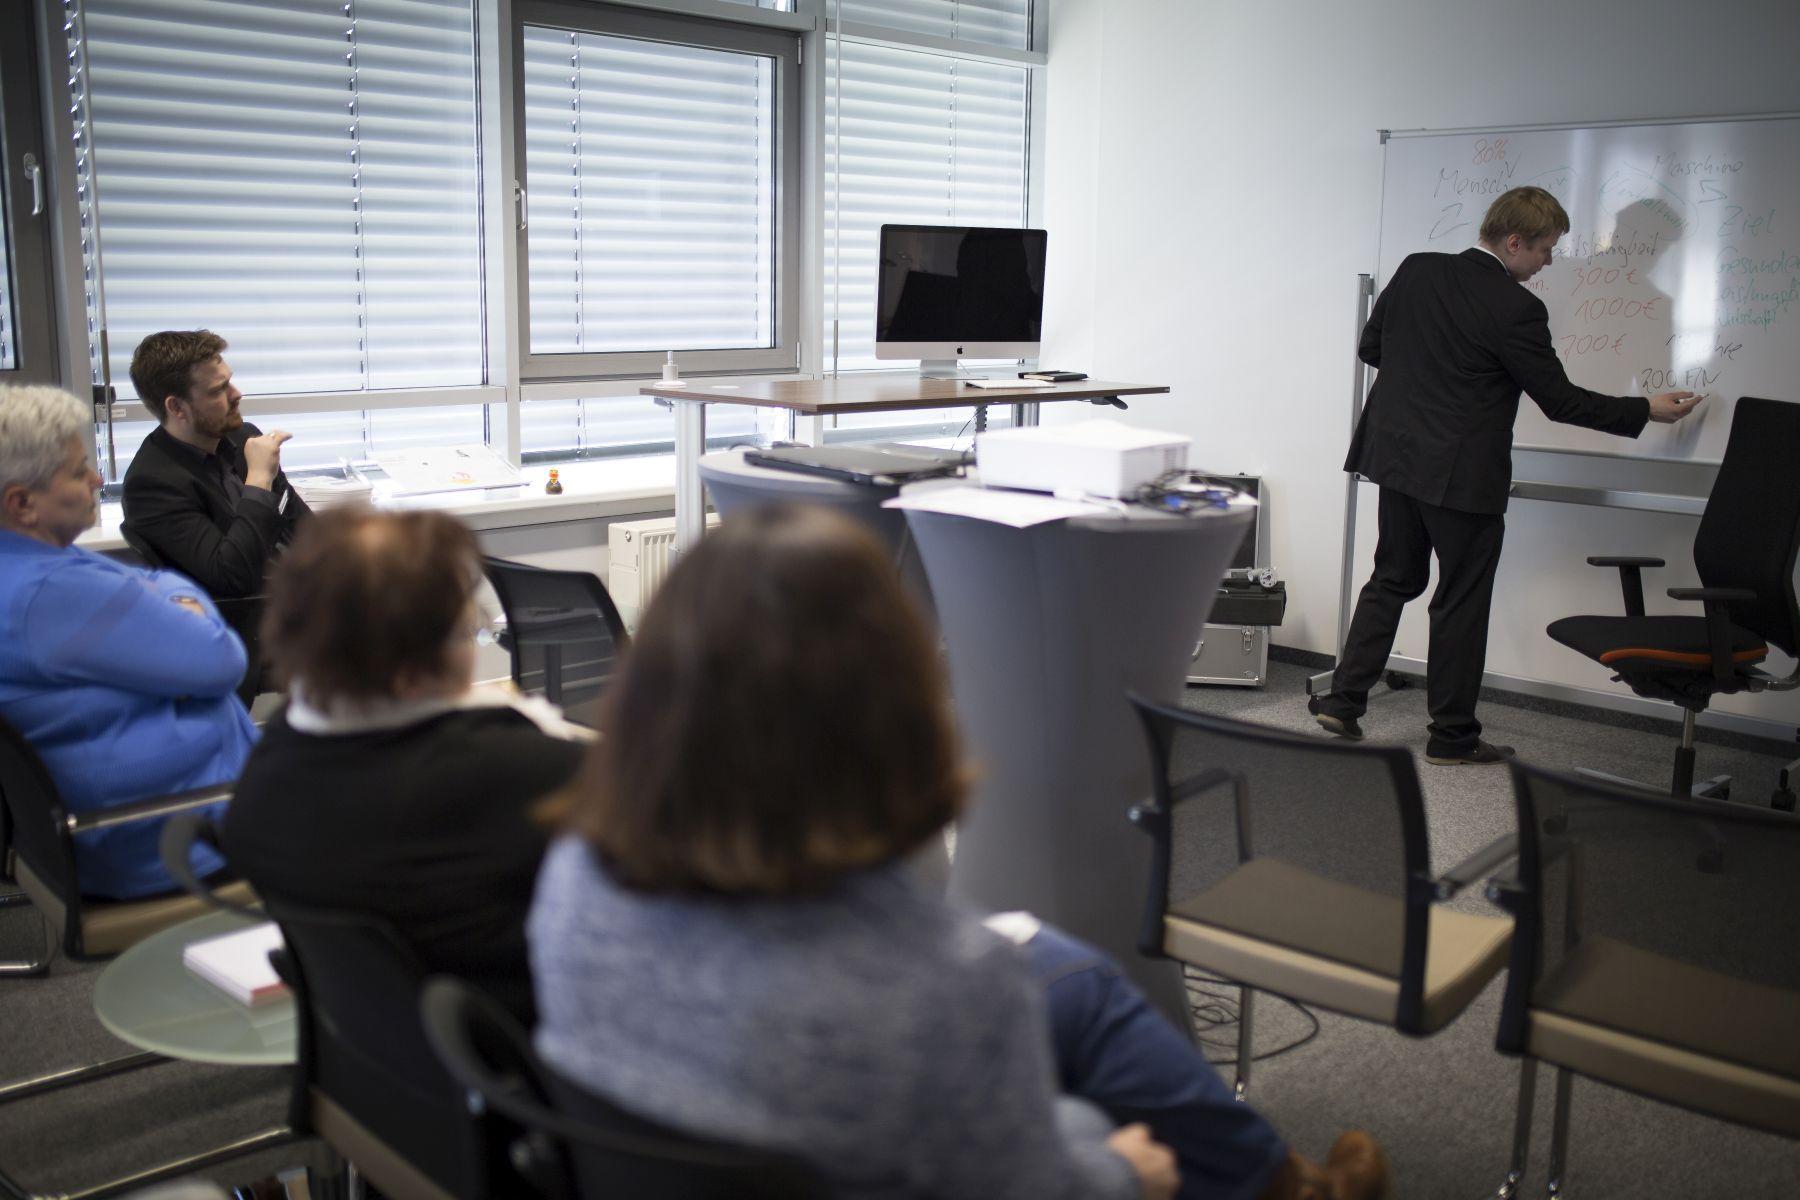 Rückblick: Ergonomie in 5 Punkten - Infoveranstaltung bei Büromöbel-Experte 27